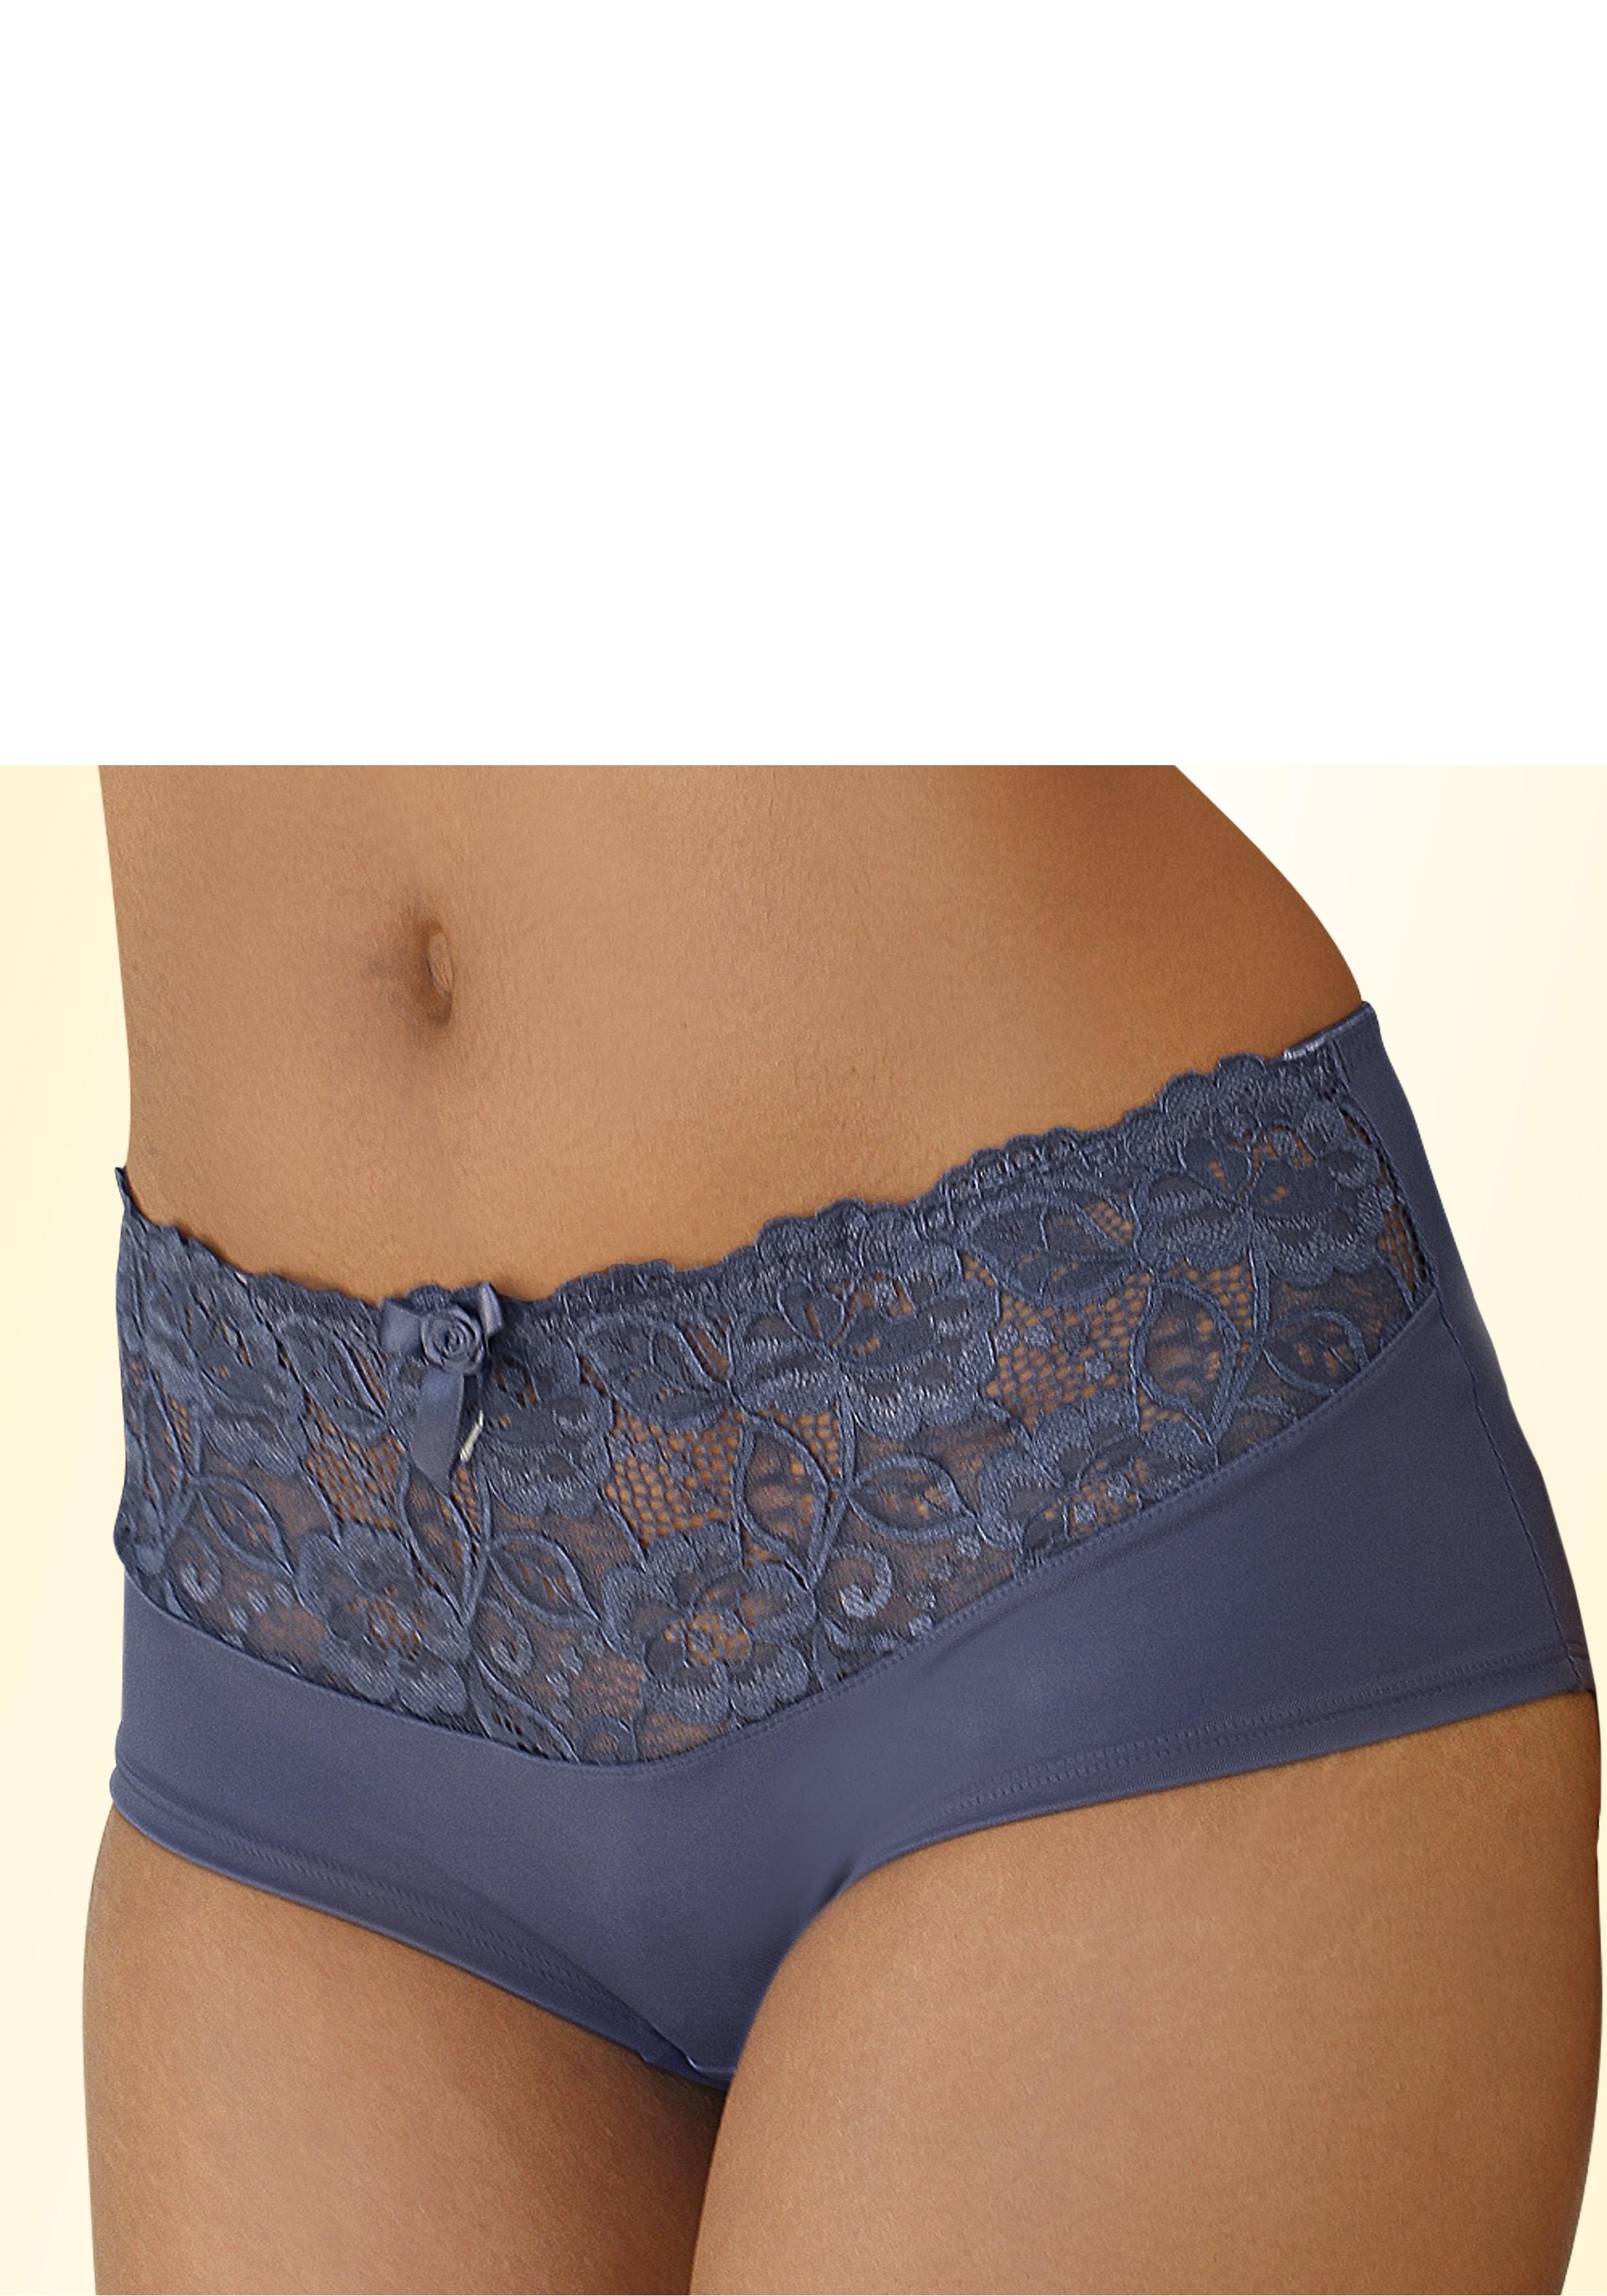 Nuance Pants - gratis ruilen op lascana.nl